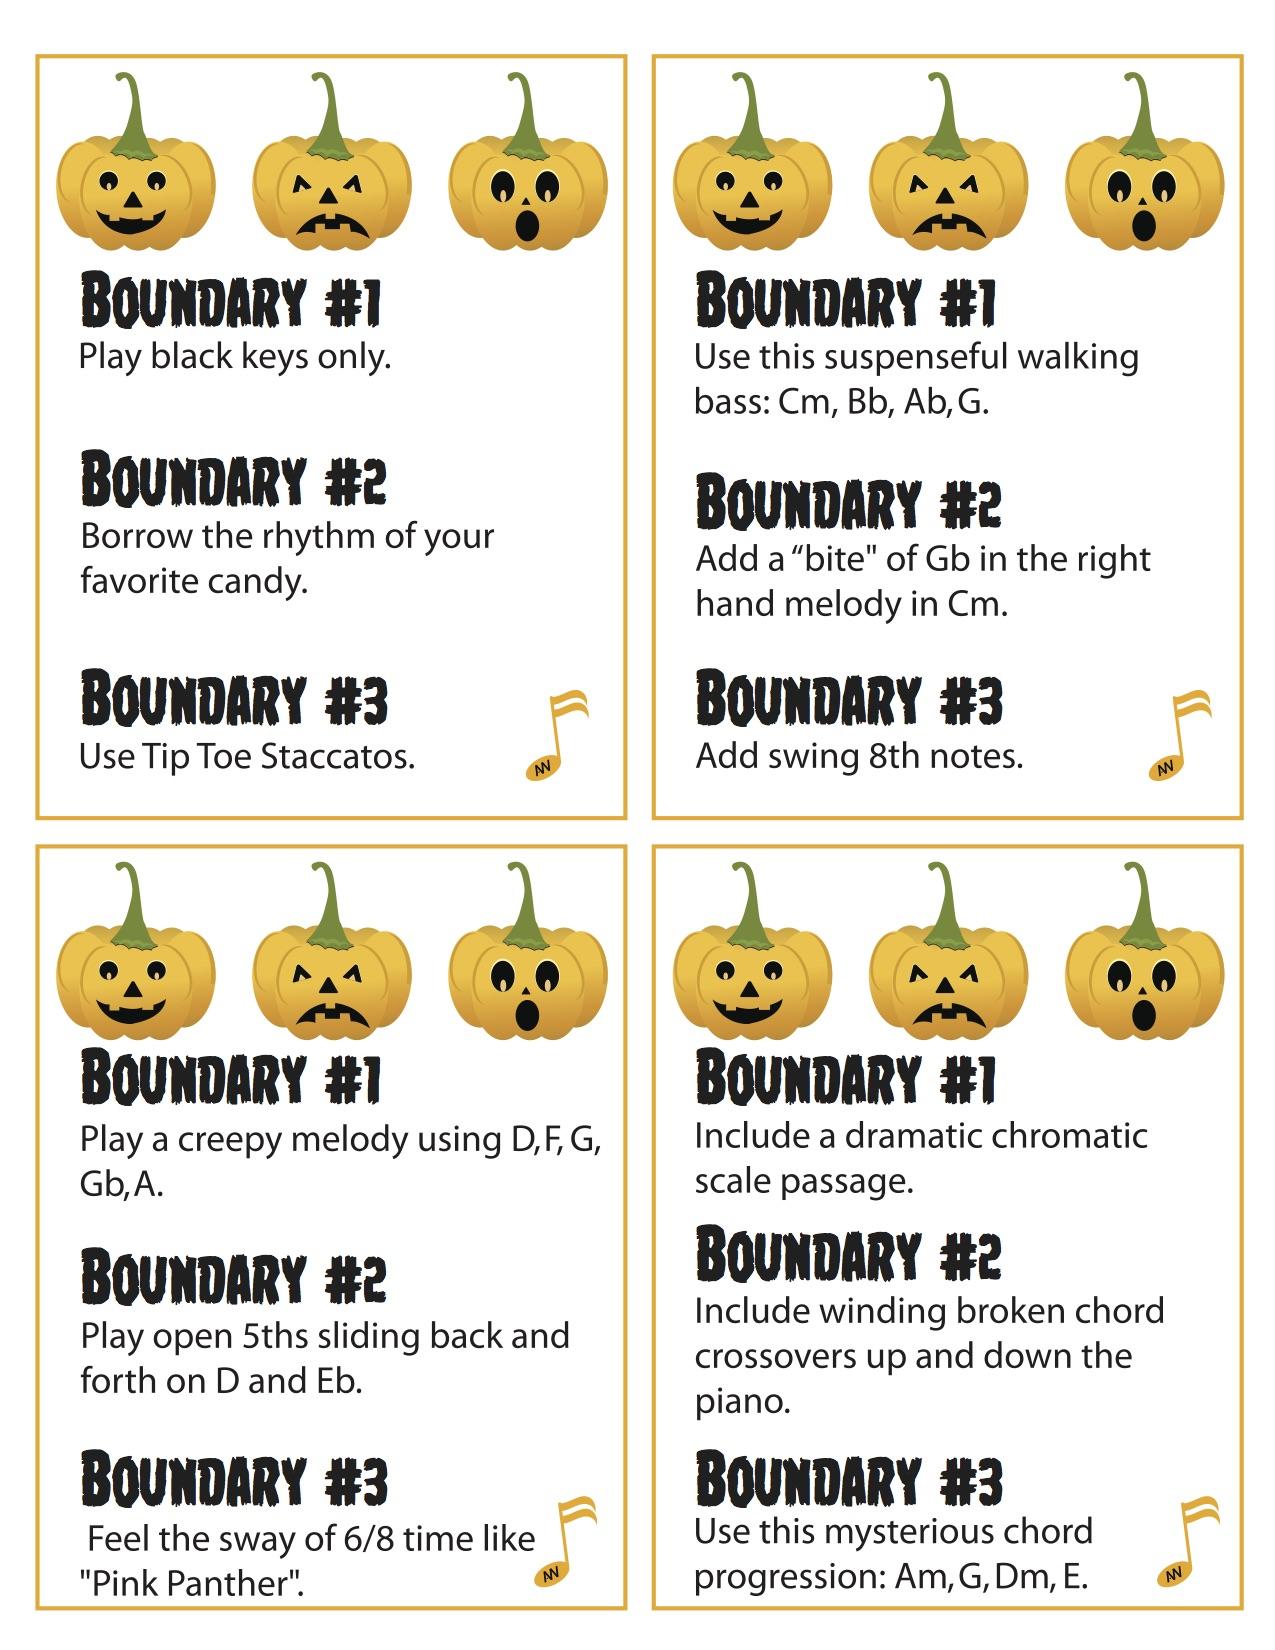 Jack O Lanterns Boundaries     Card.jpg